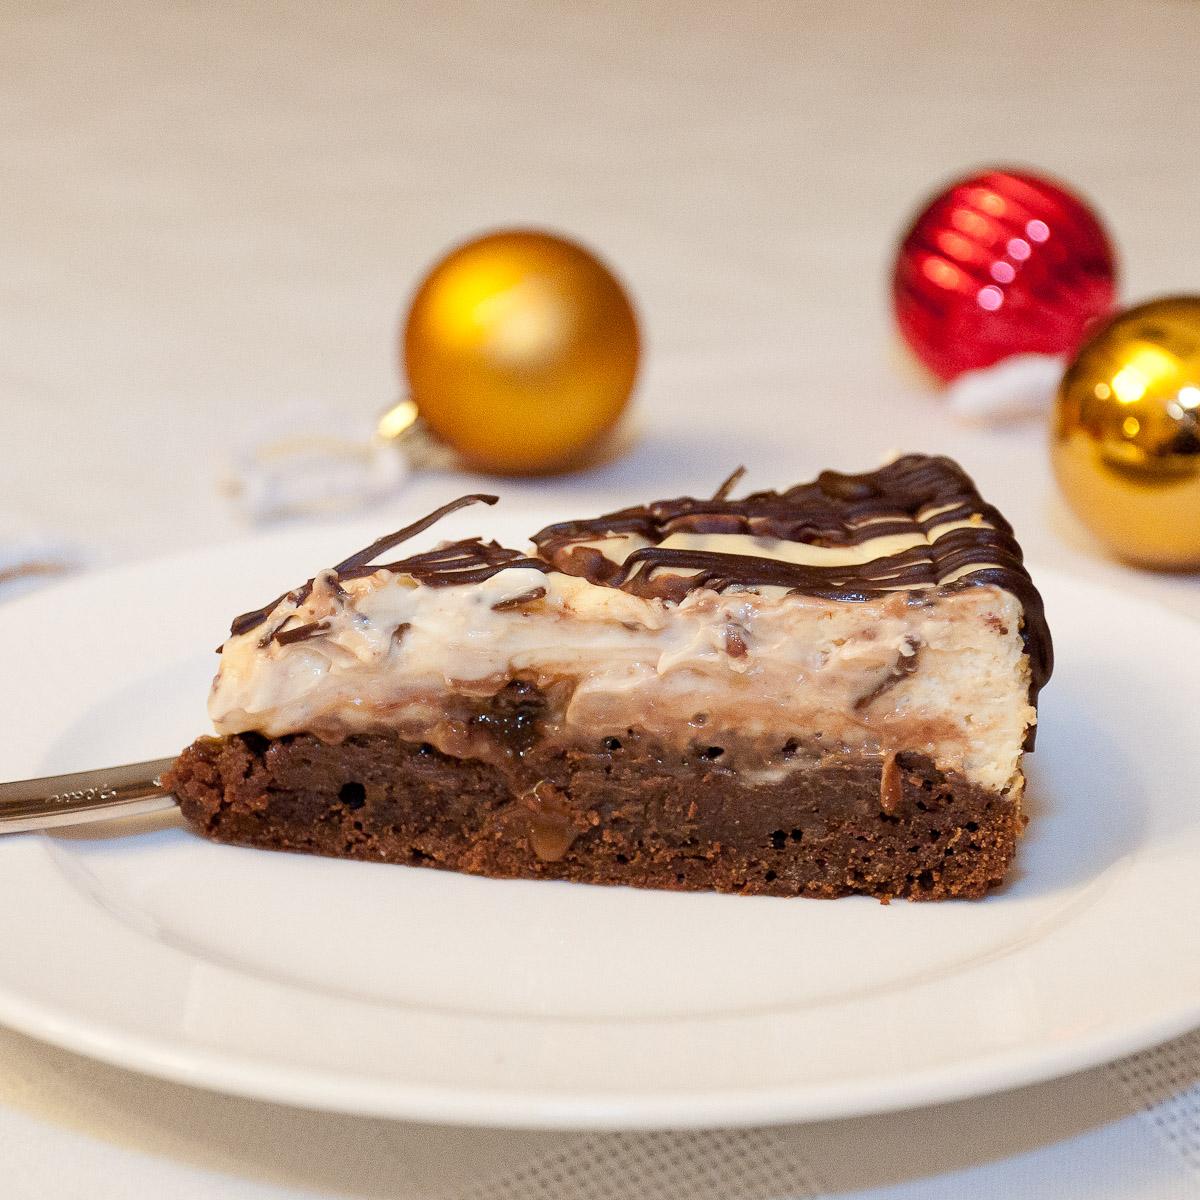 brownie, cheesecake, caramel, rolo, chocolate, holiday, cream cheese